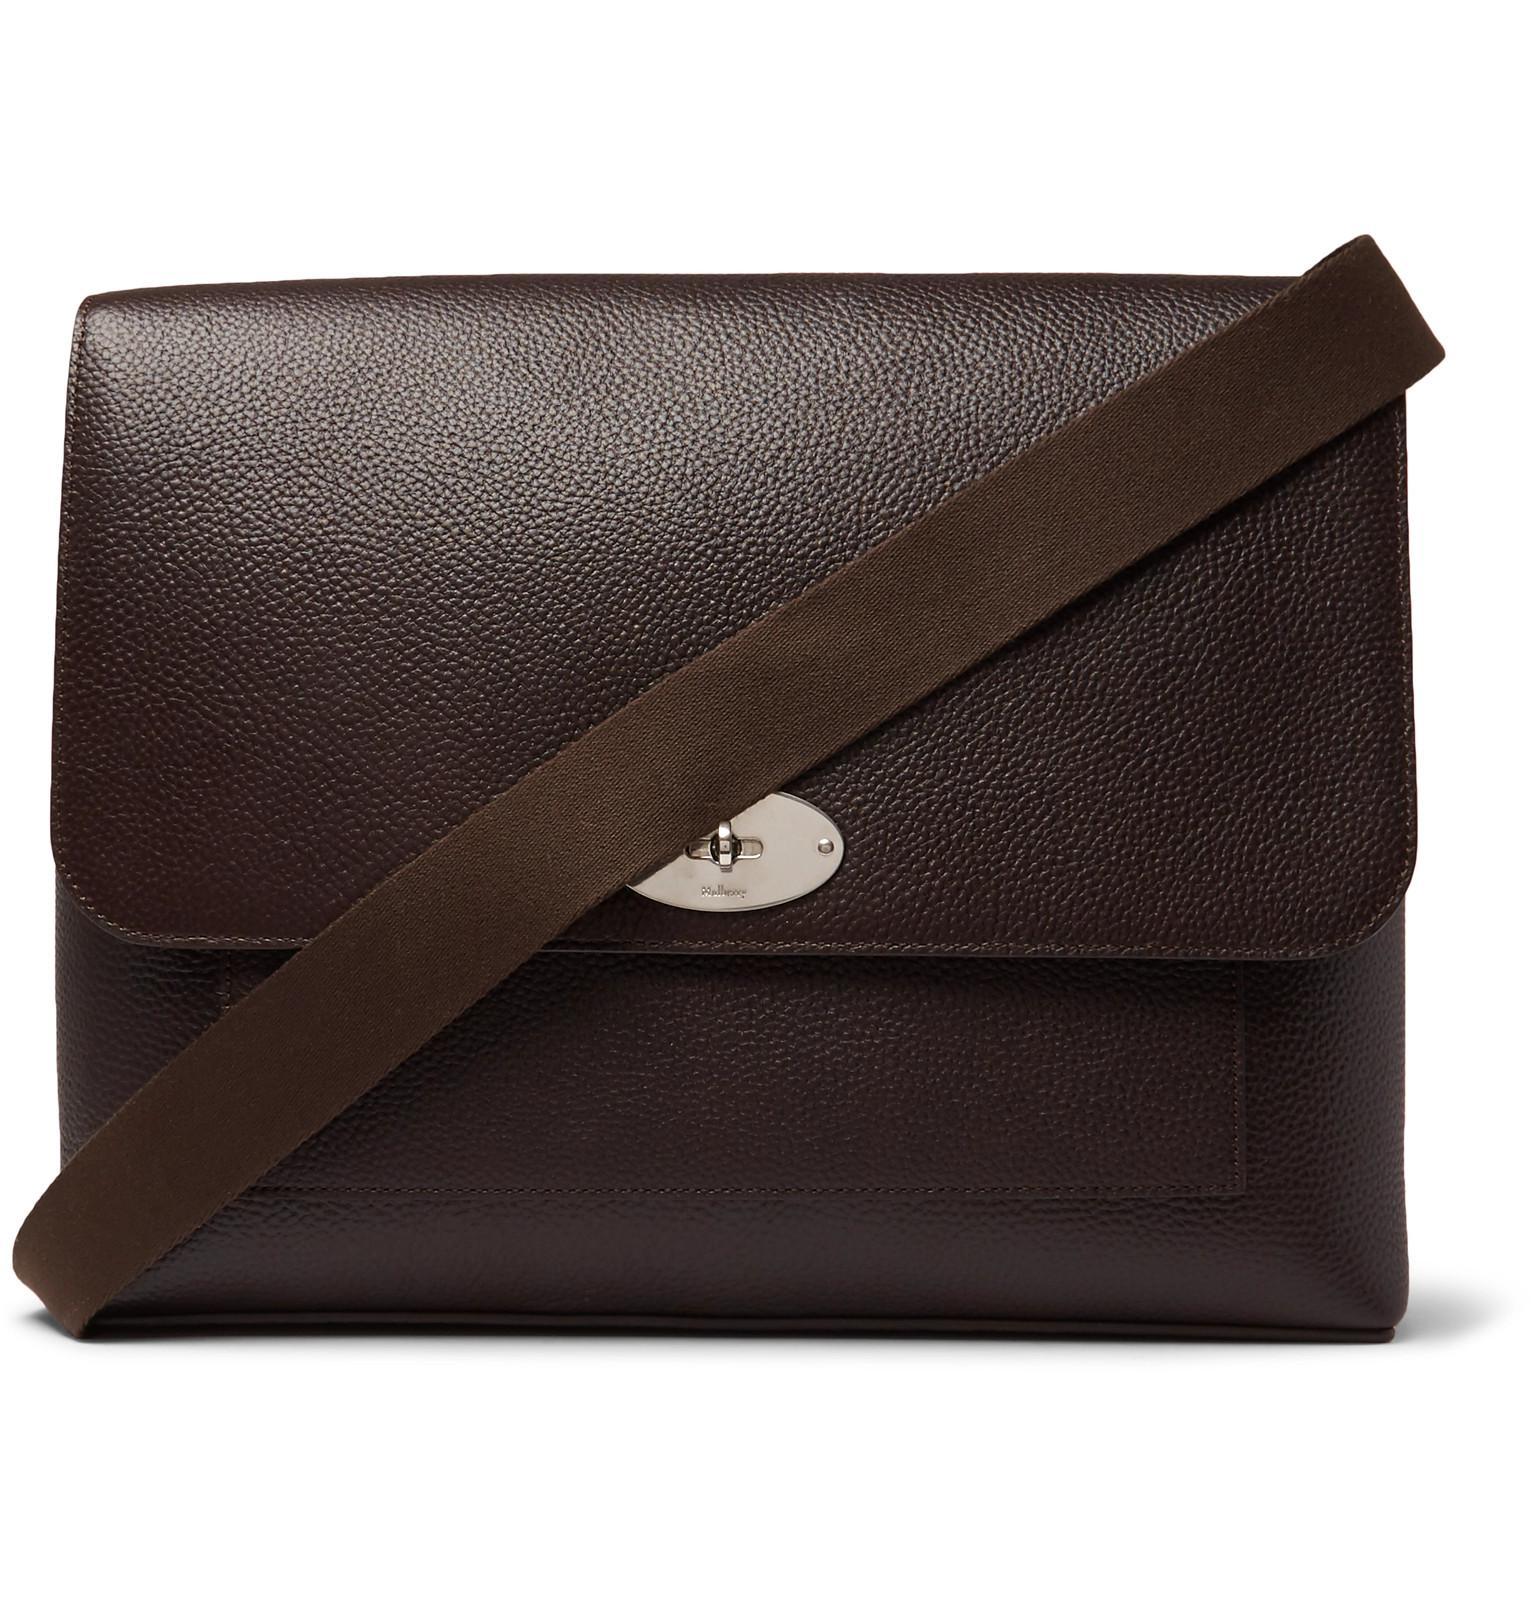 Mulberry. Men s Brown East West Antony Padlock Pebble-grain Leather  Messenger Bag e744dfffab25a